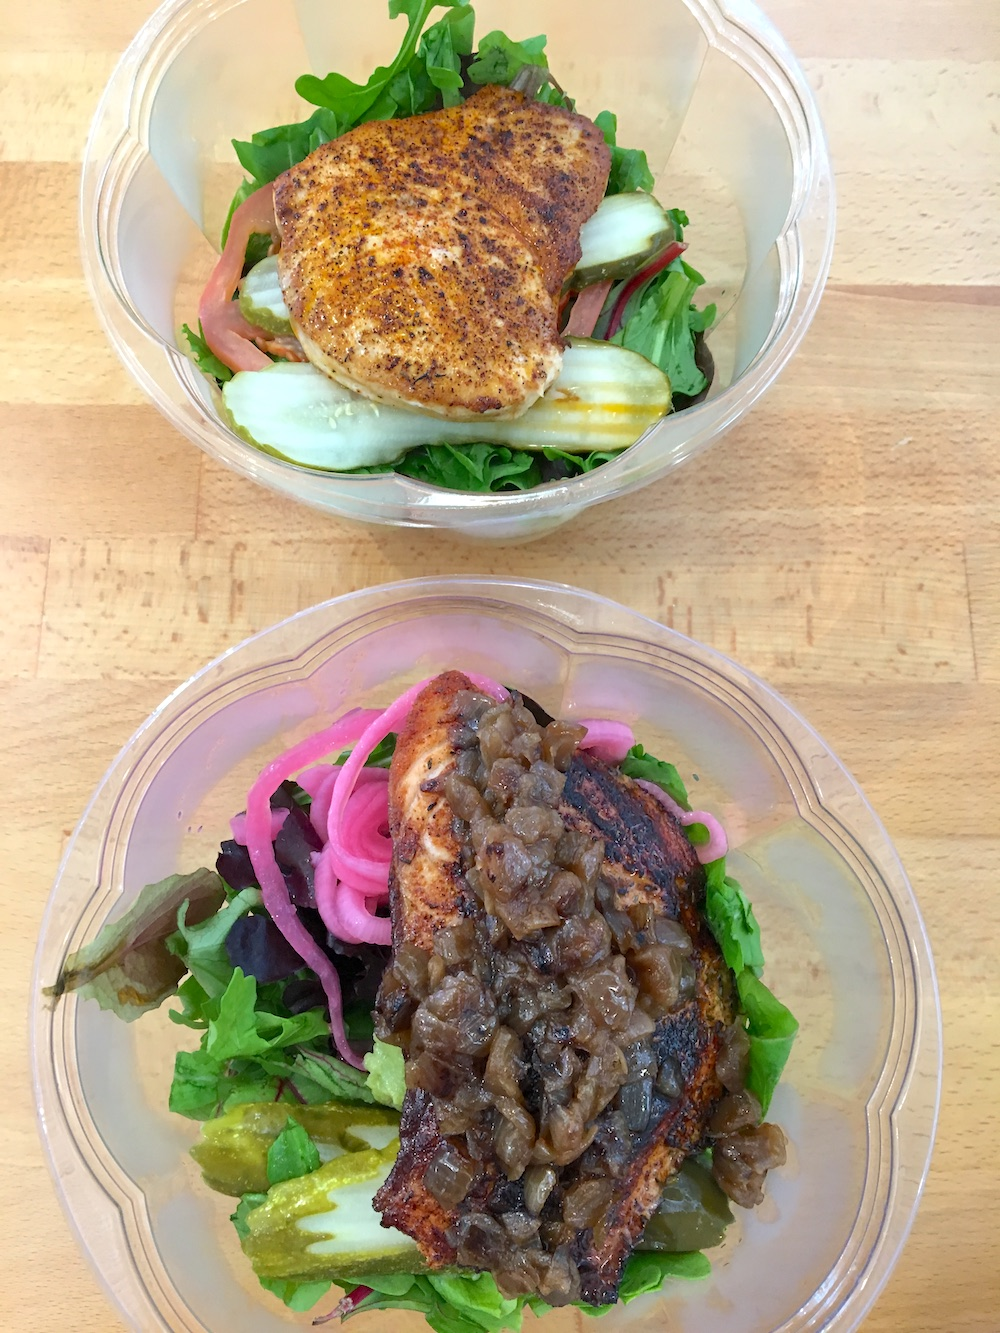 Strfsh fish salads from the Voltaggio Brothers in Santa Monica's 3rd Street Promenade | TastingPage.com